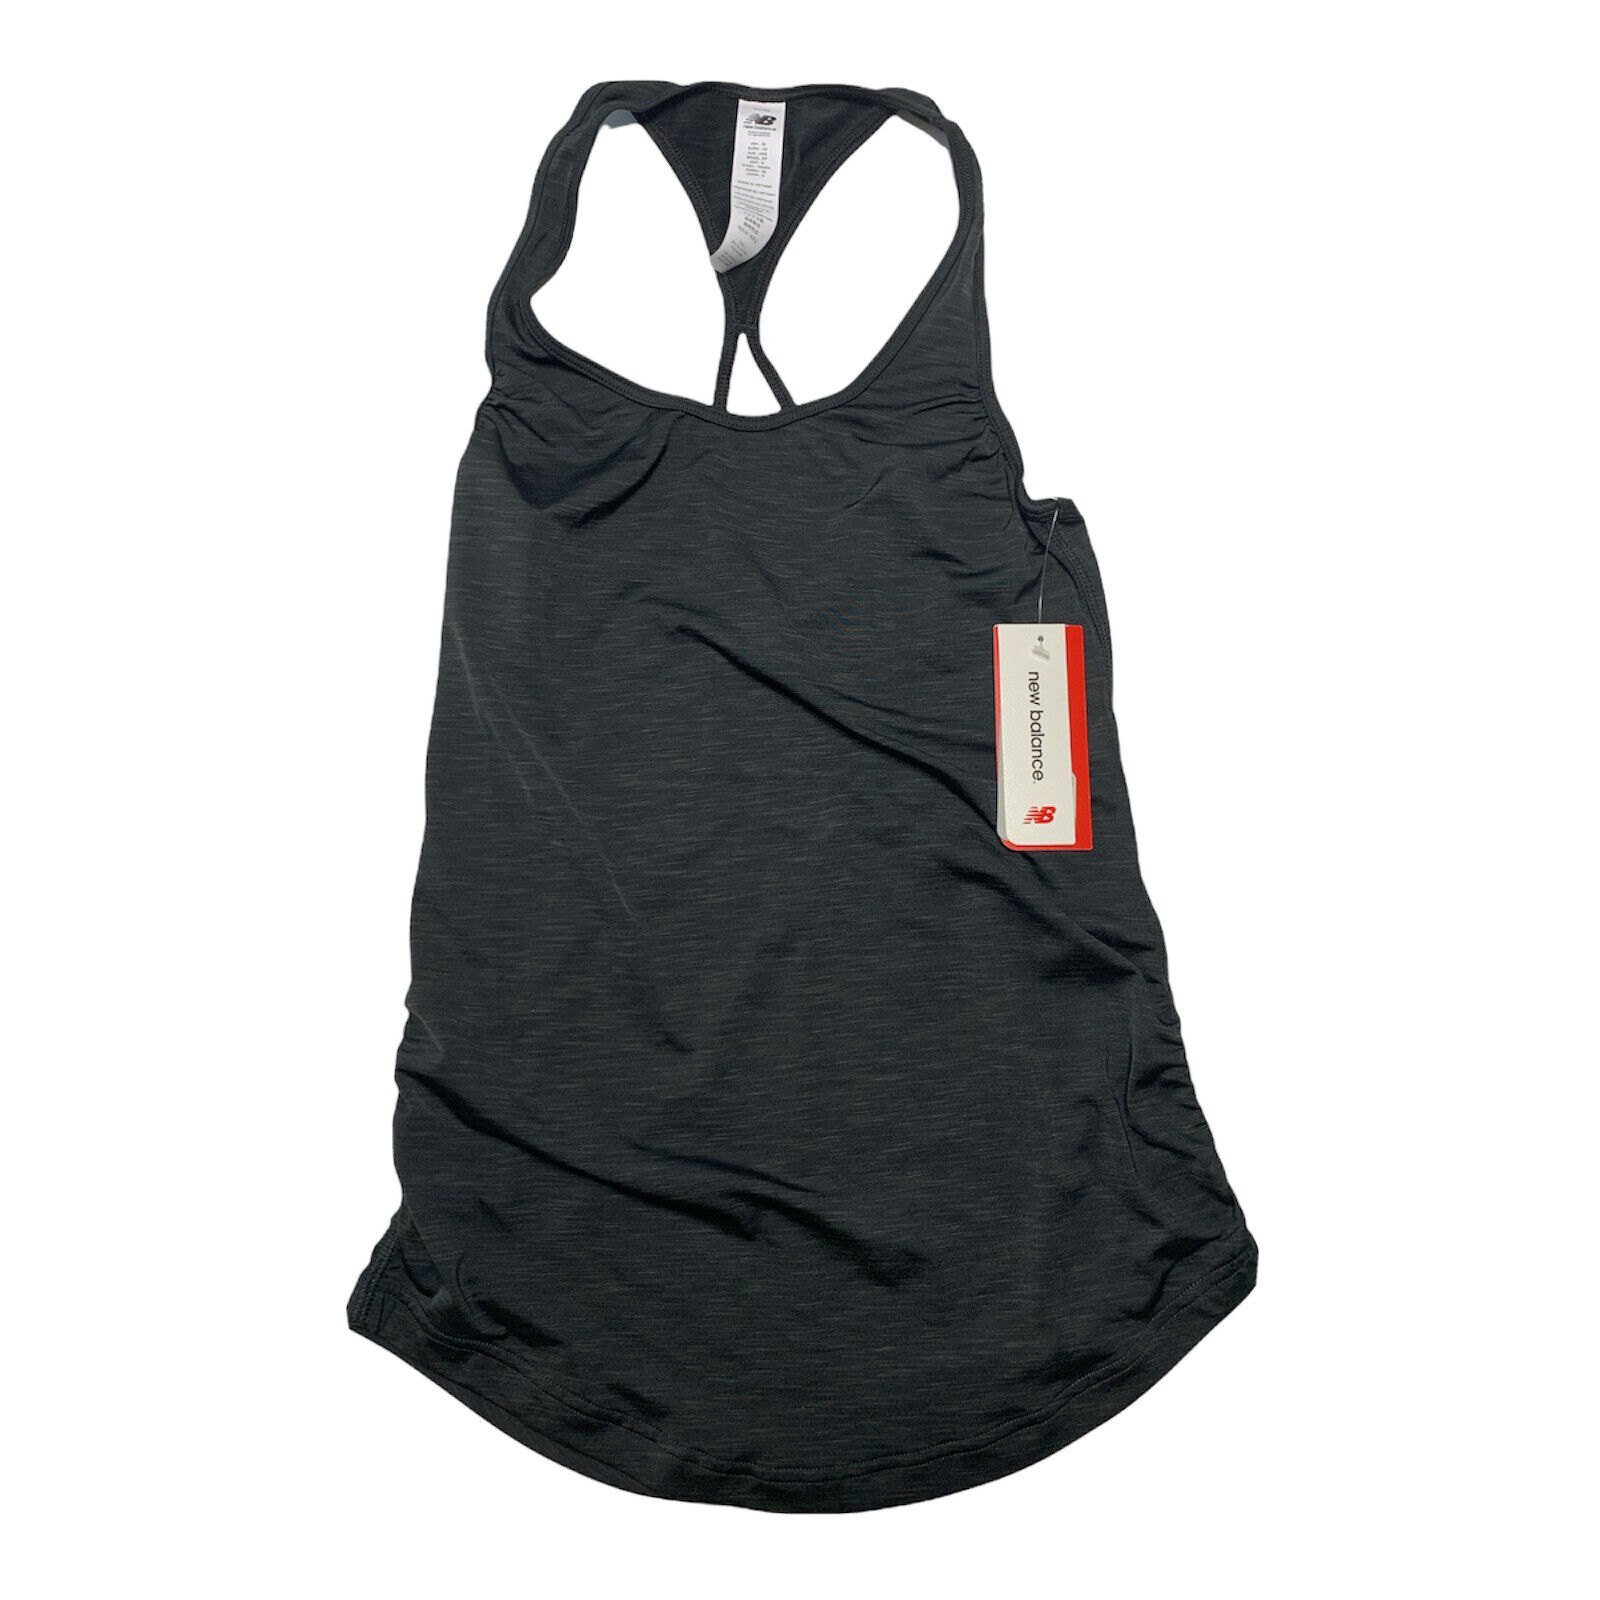 New Balance Women's Fashion Tank Black Heather Size Extra Small